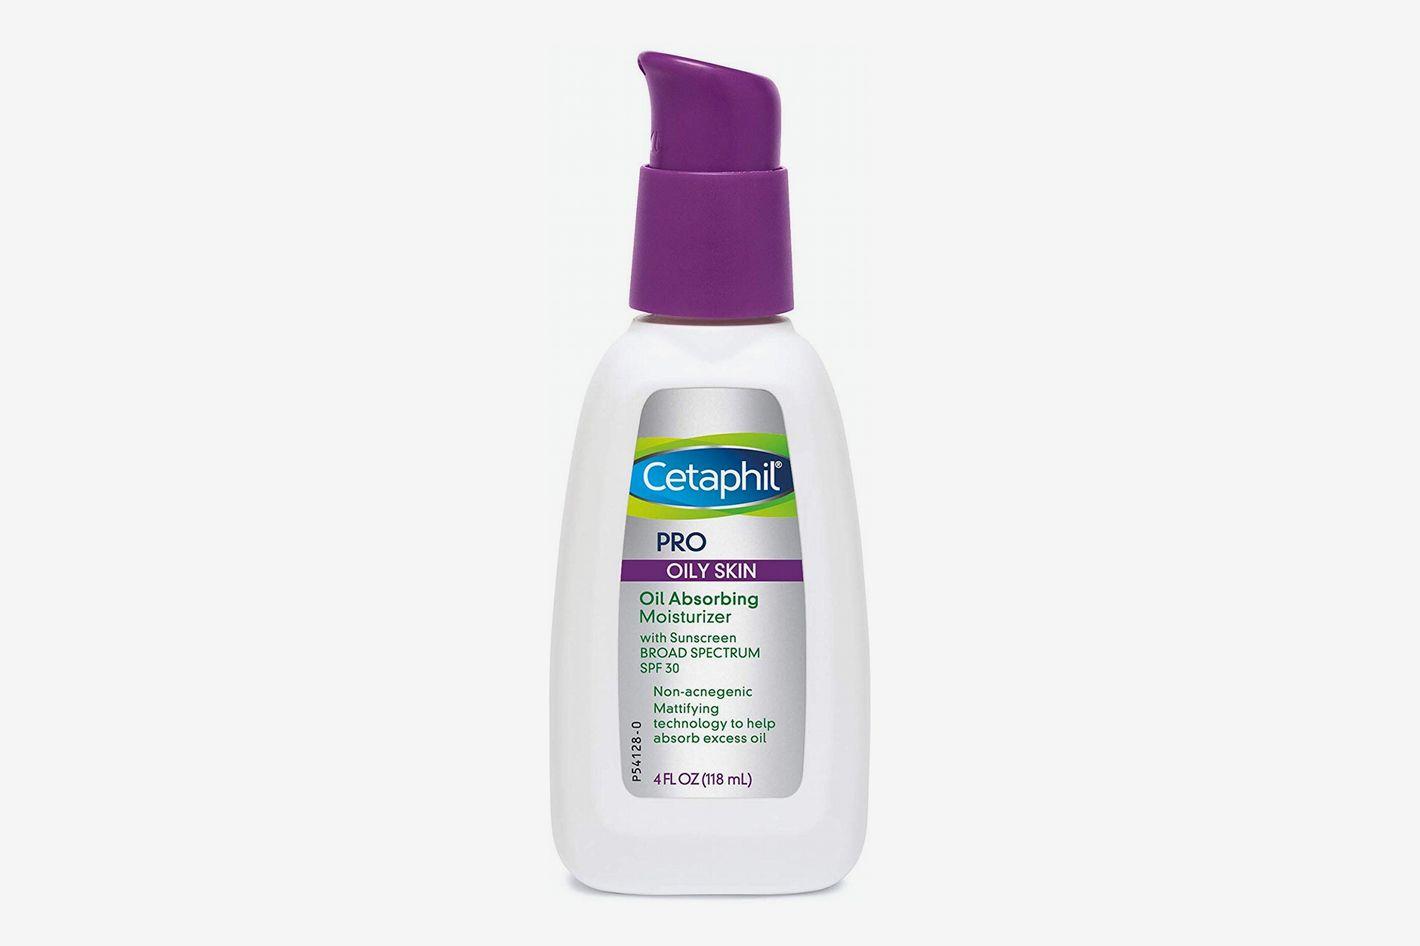 Cetaphil PRO Oil Absorbing Moisturizer SPF 30